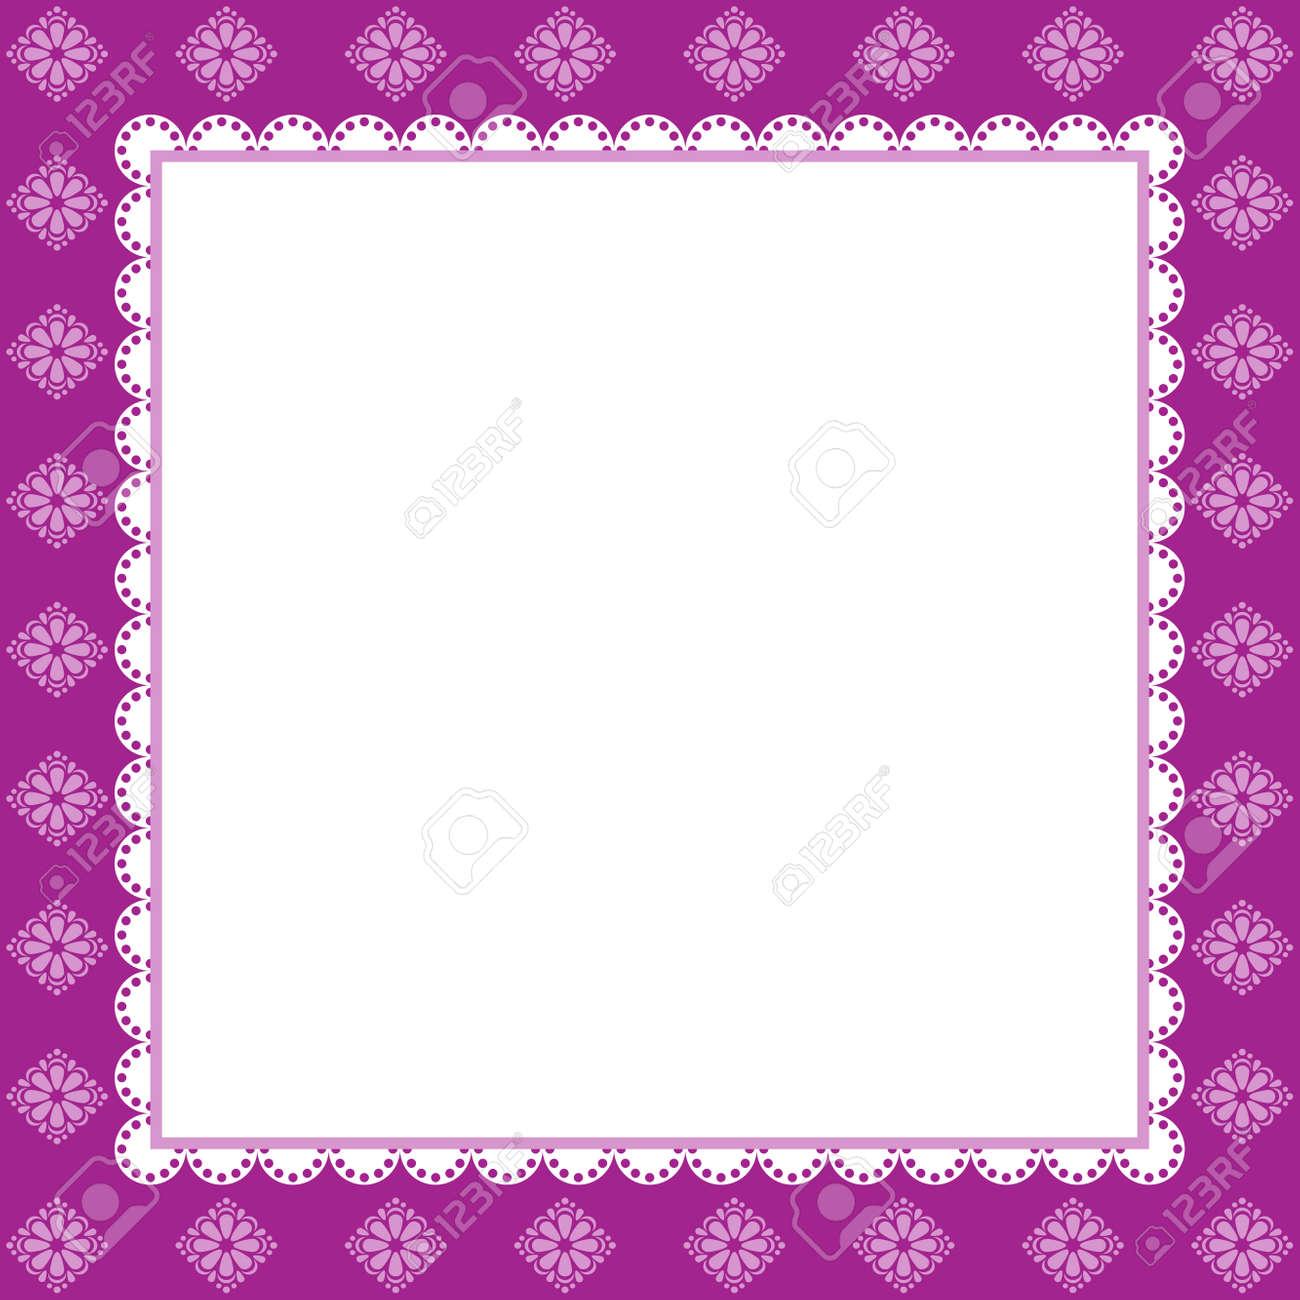 Vintage Greeting Card Template. Invitation. Lilac Illustration Stock ...